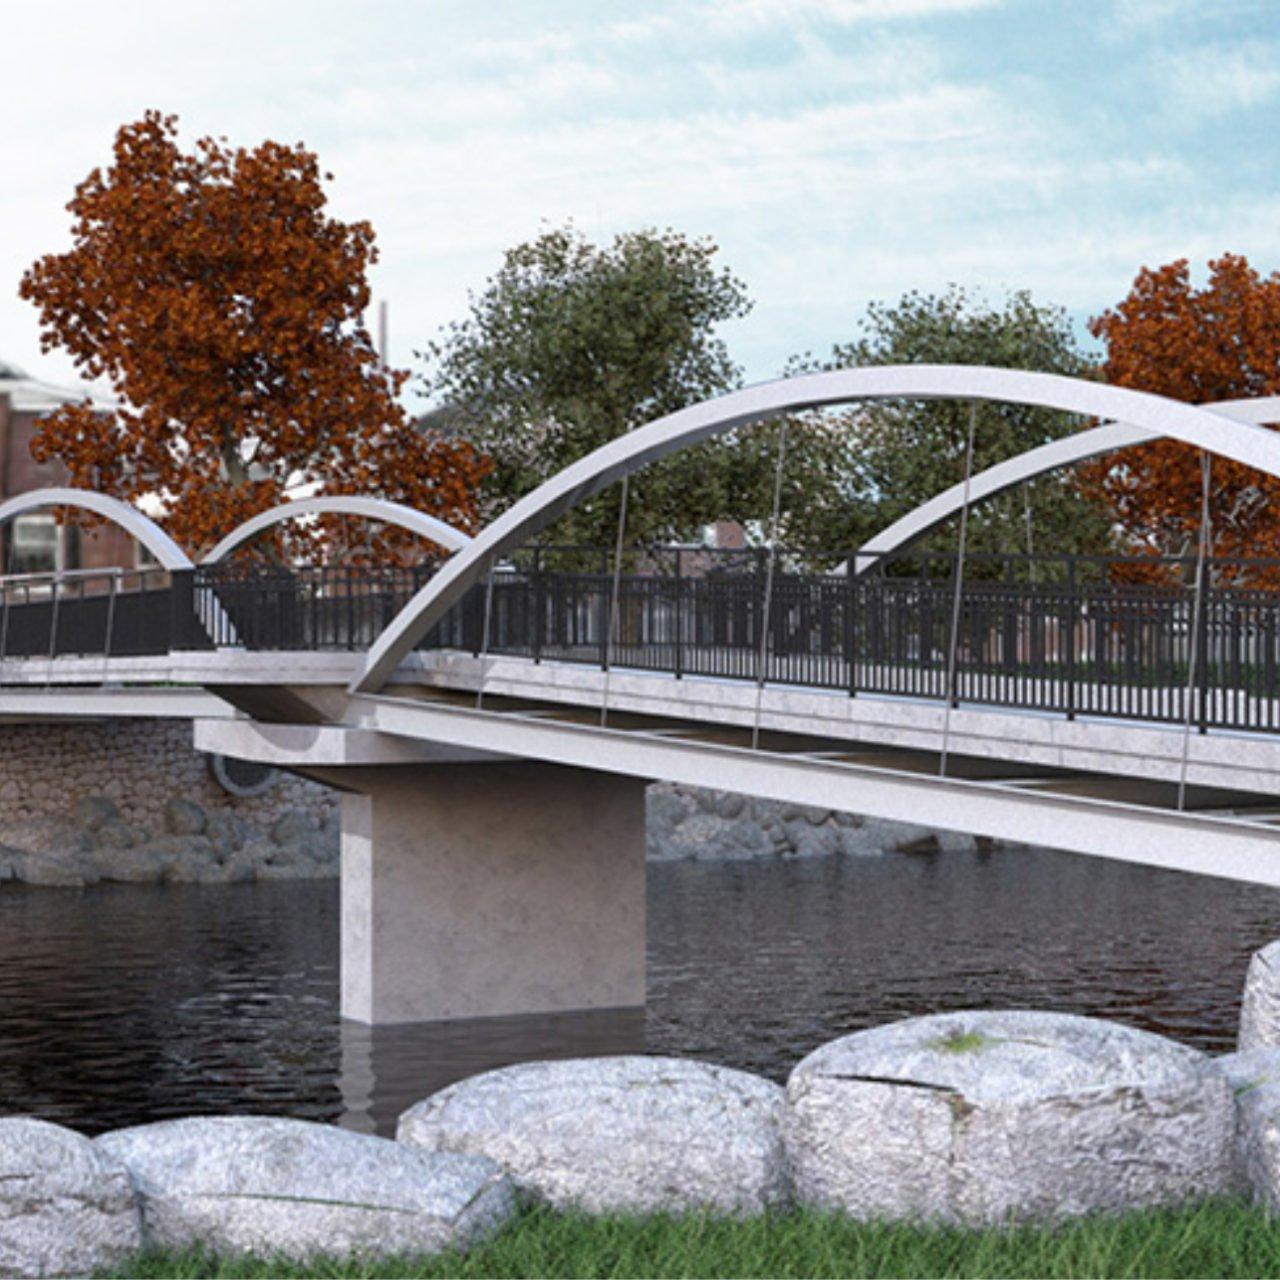 Pedestrian Bridge in 2020